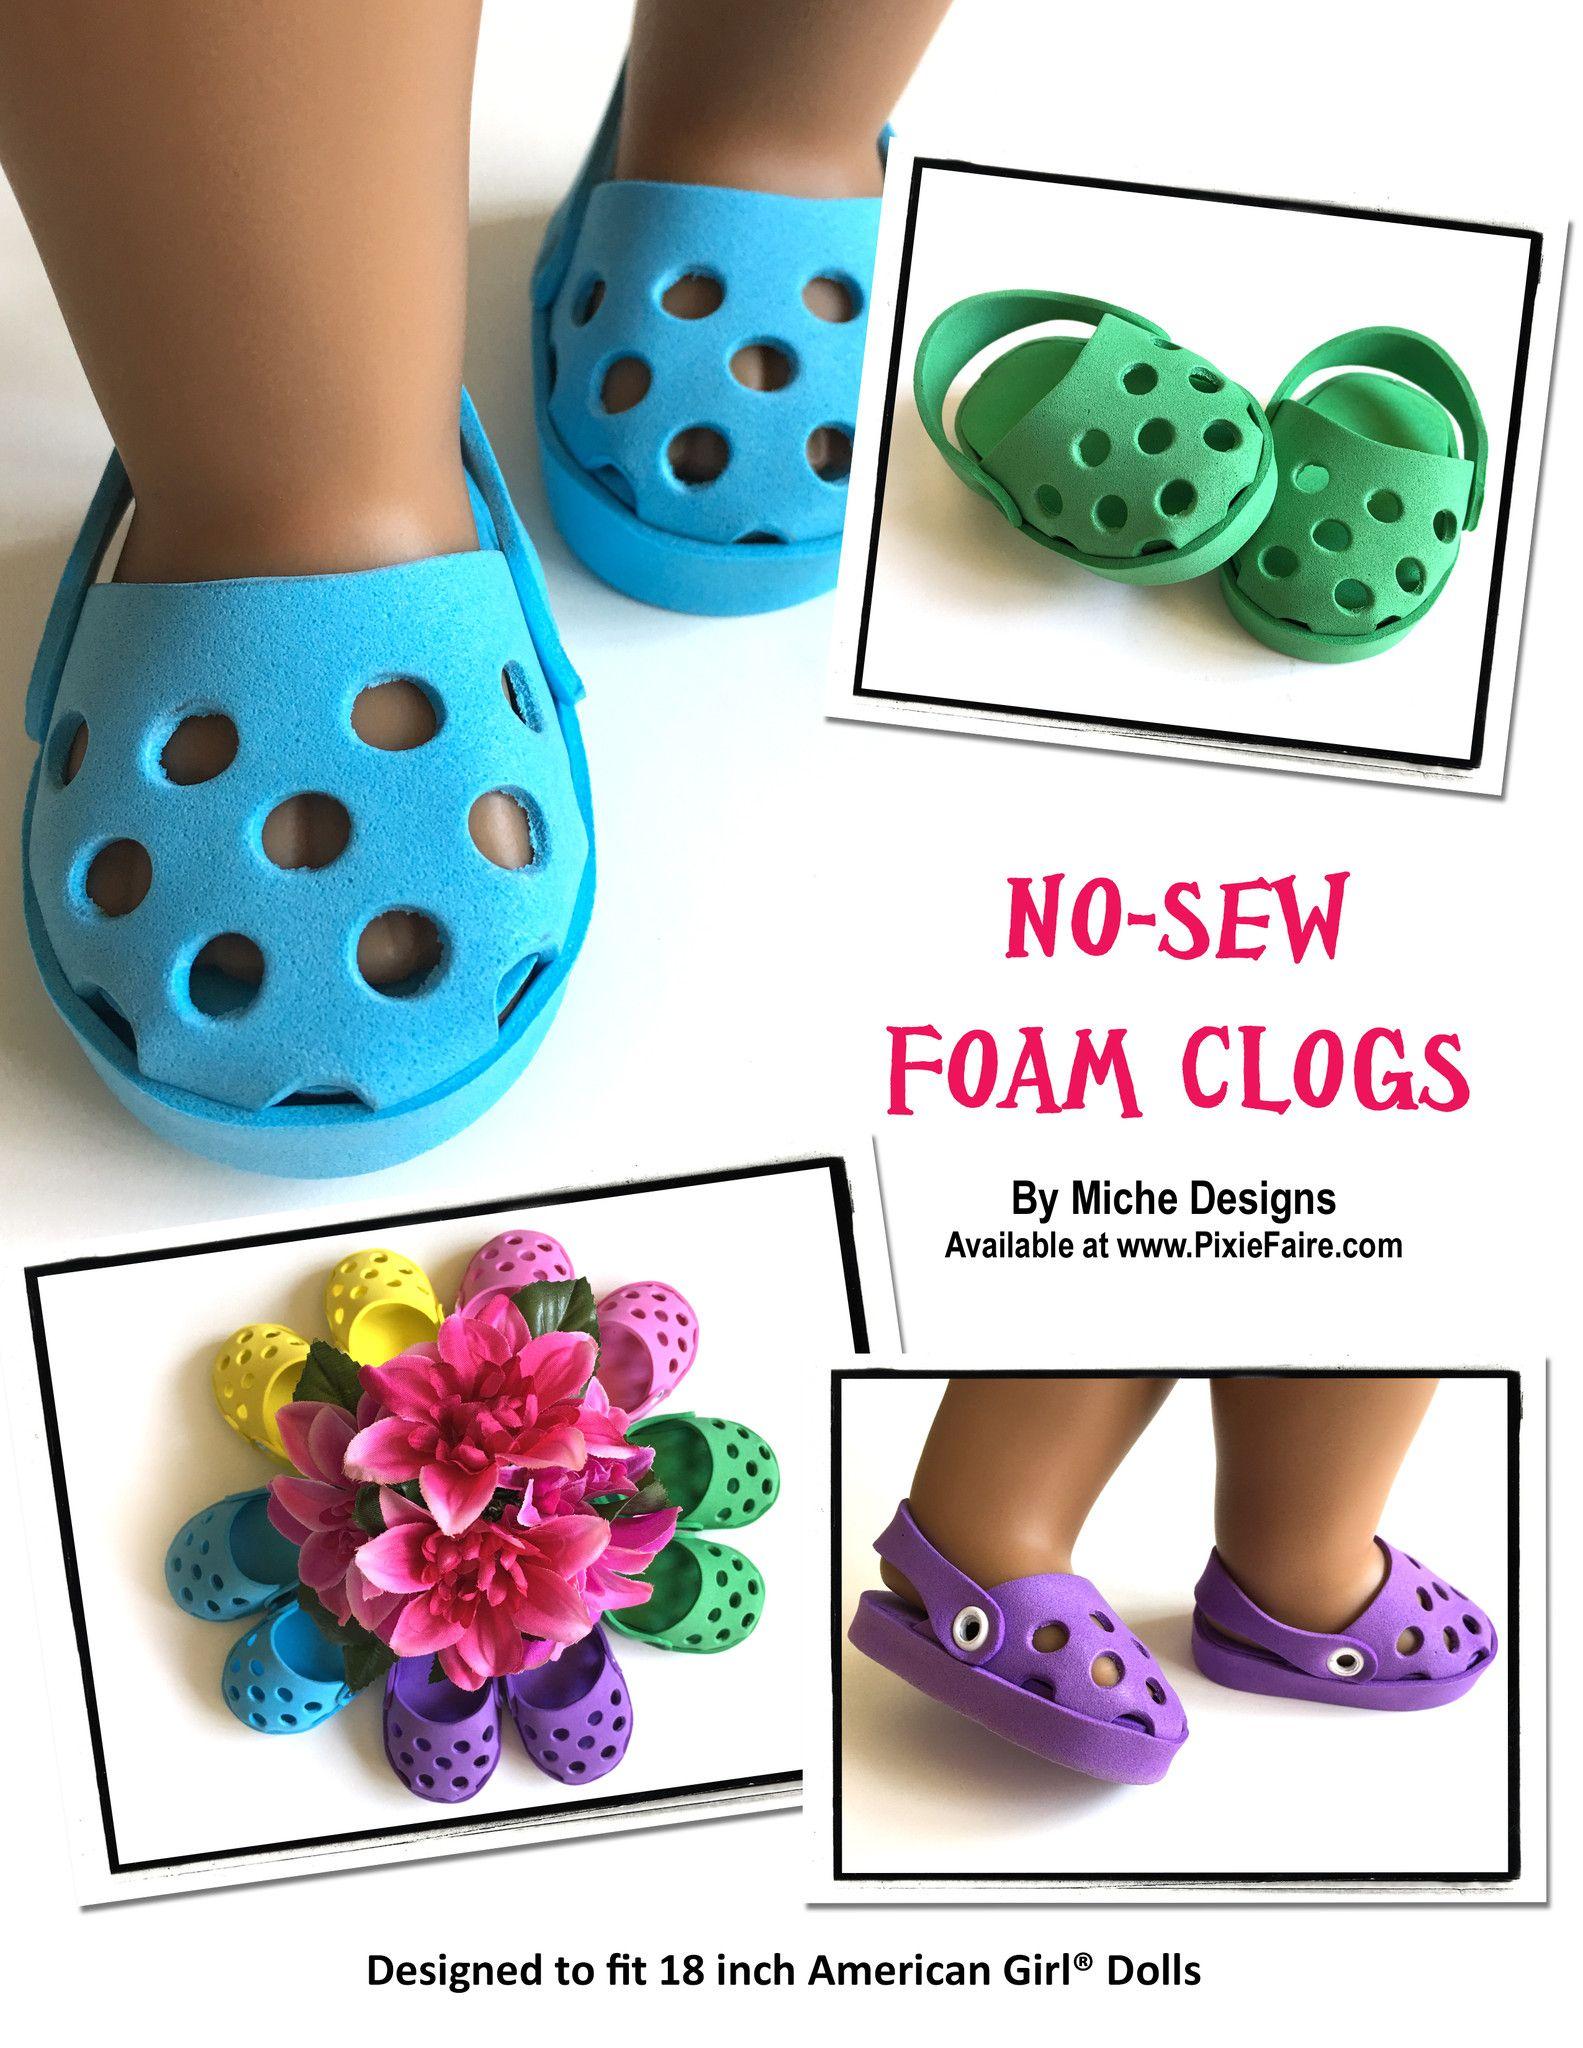 "No Sew Foam Clogs 18"" Doll Shoes"